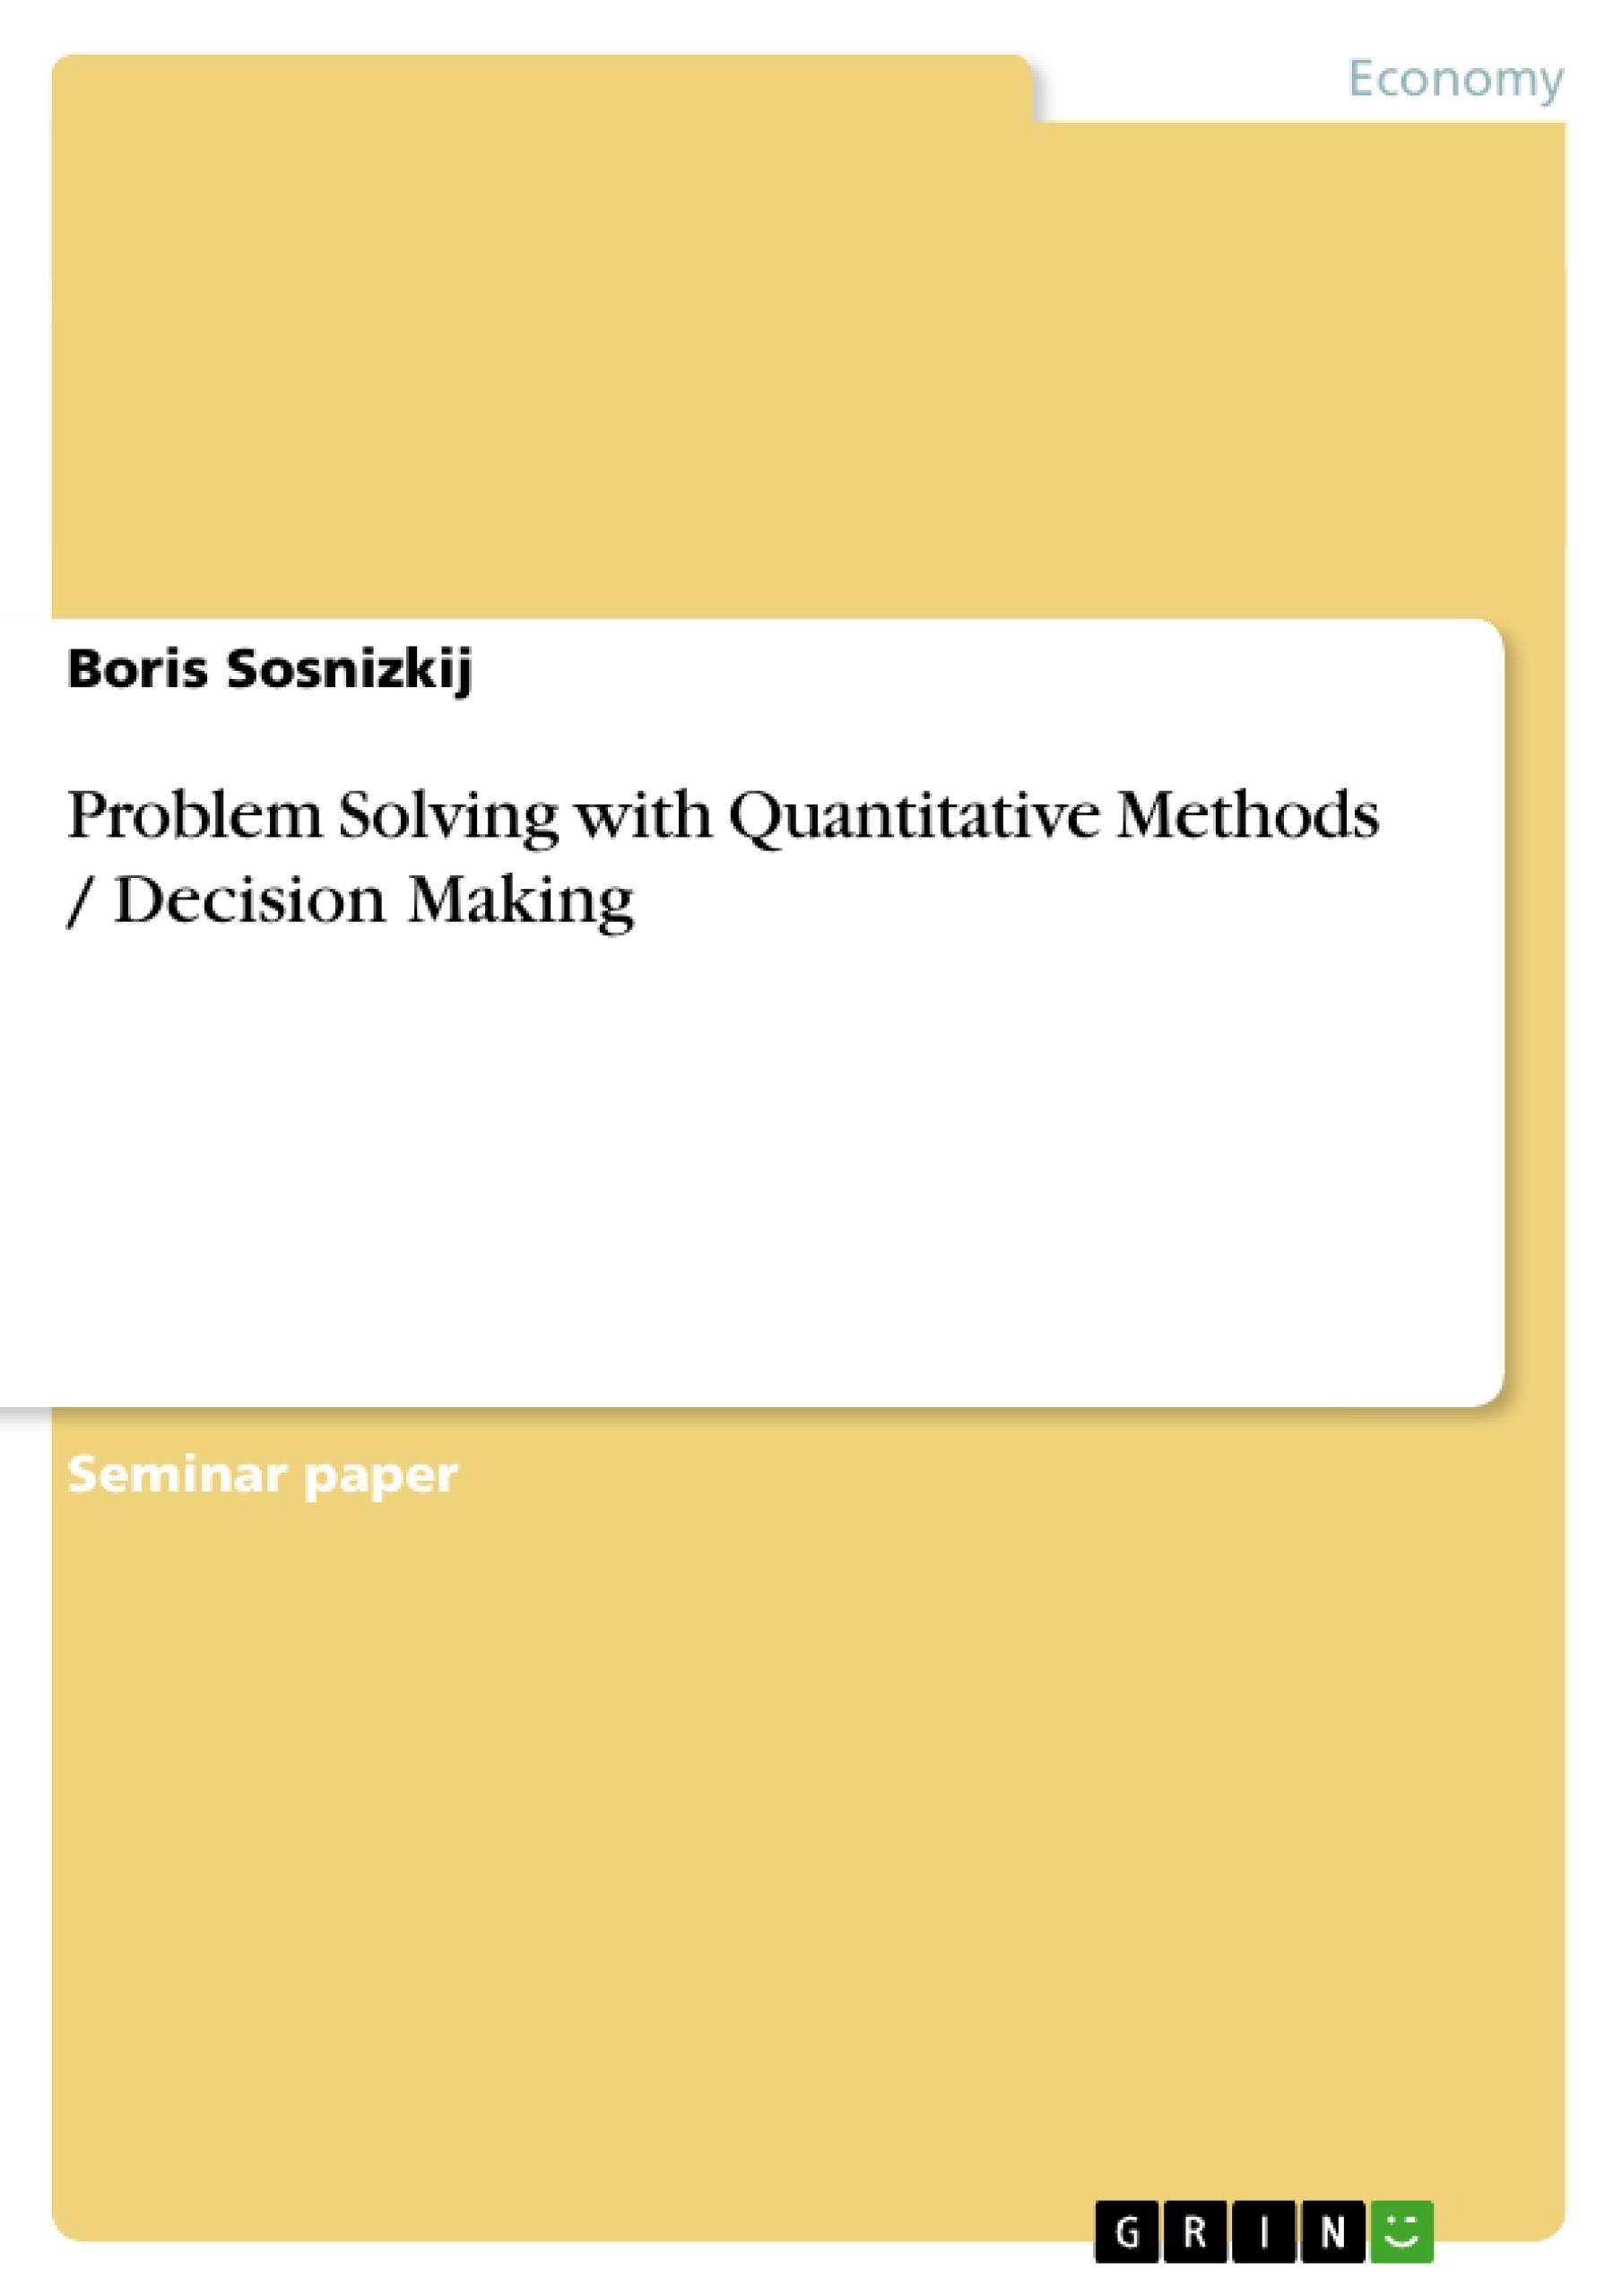 Title: Problem Solving with Quantitative Methods / Decision Making